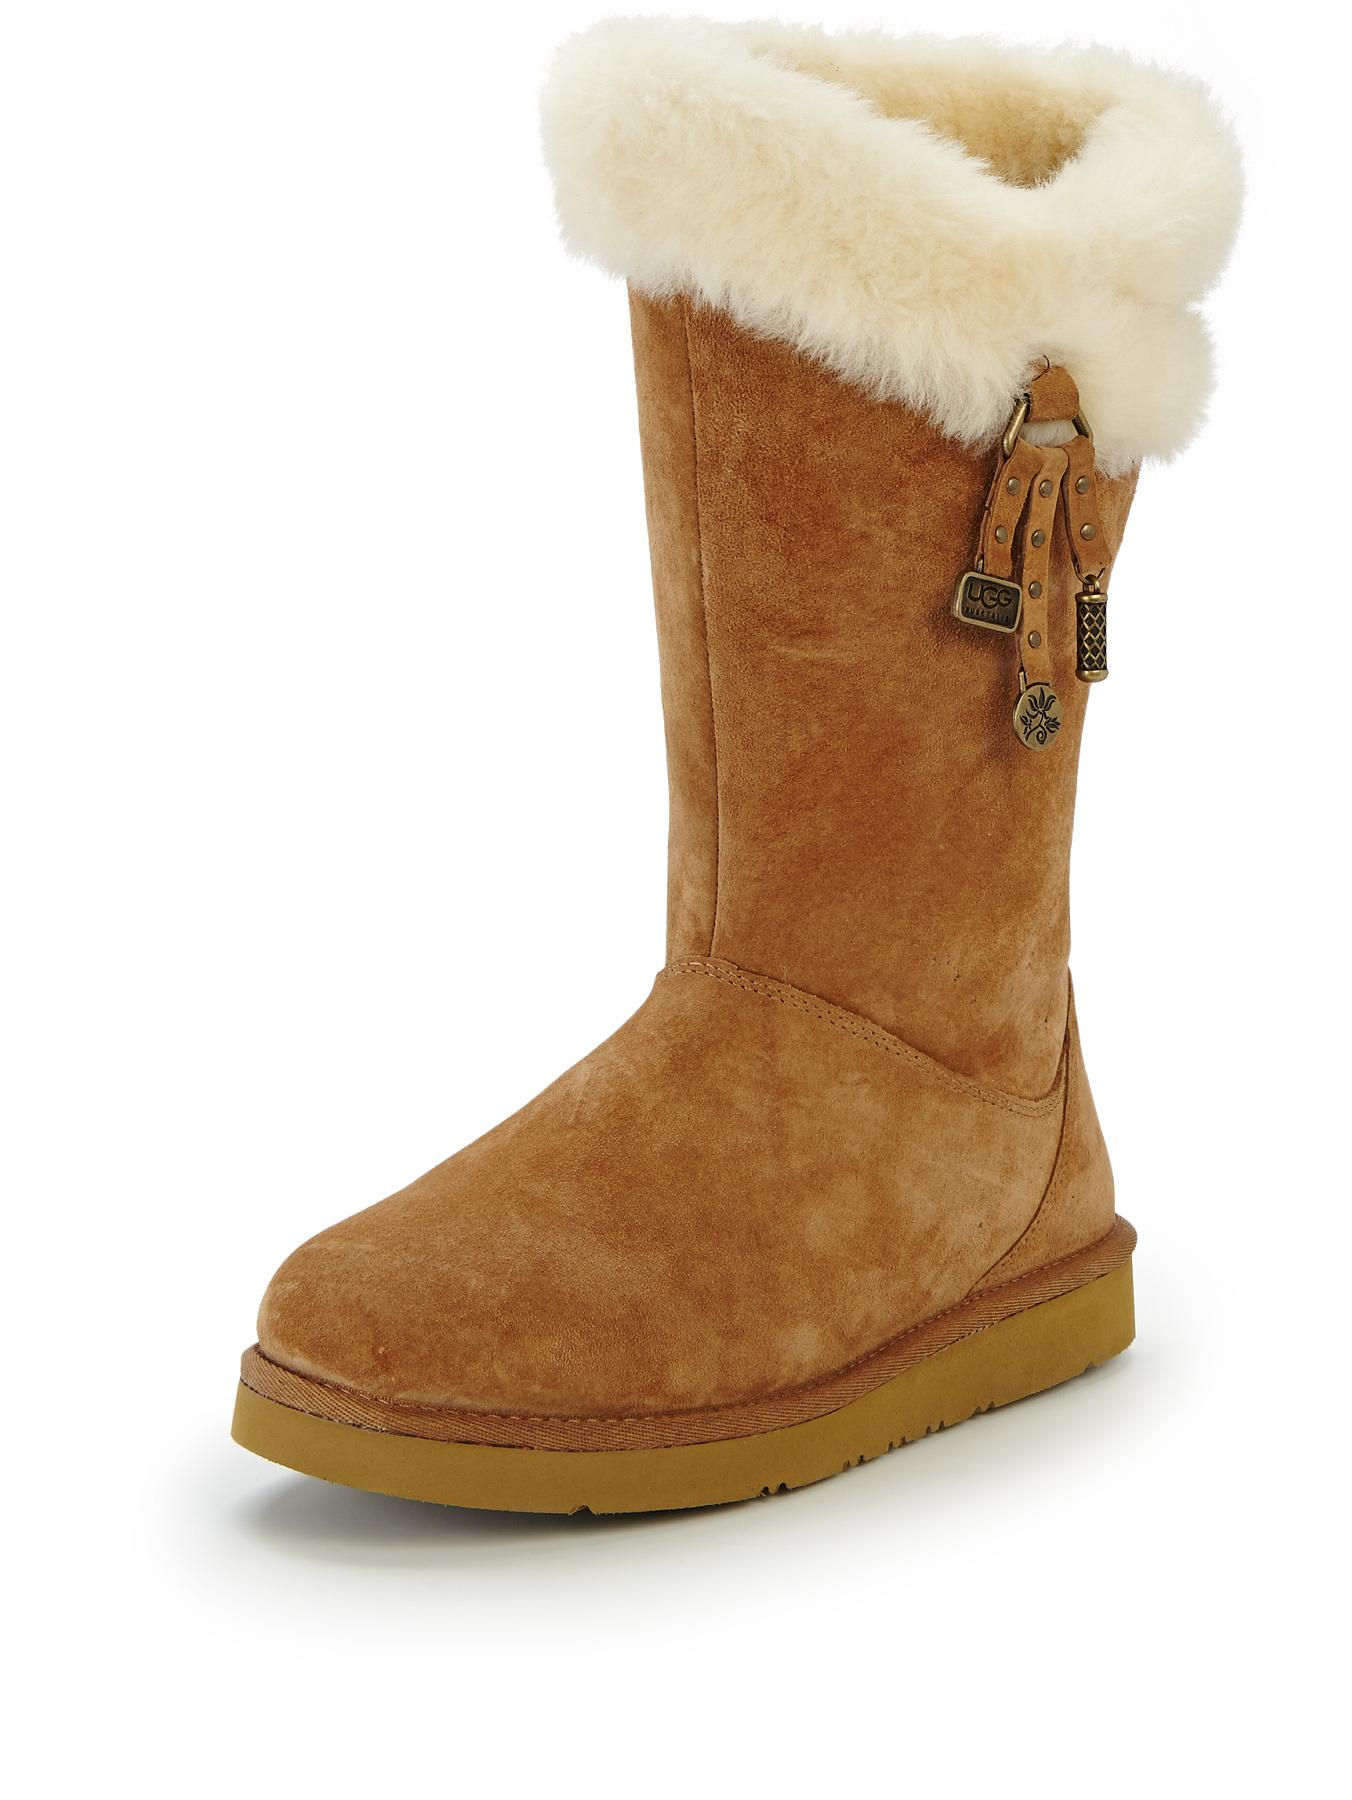 Ugg Plumdale Boots Uk Boots 15026 Uk 201660c - deltaportal.info